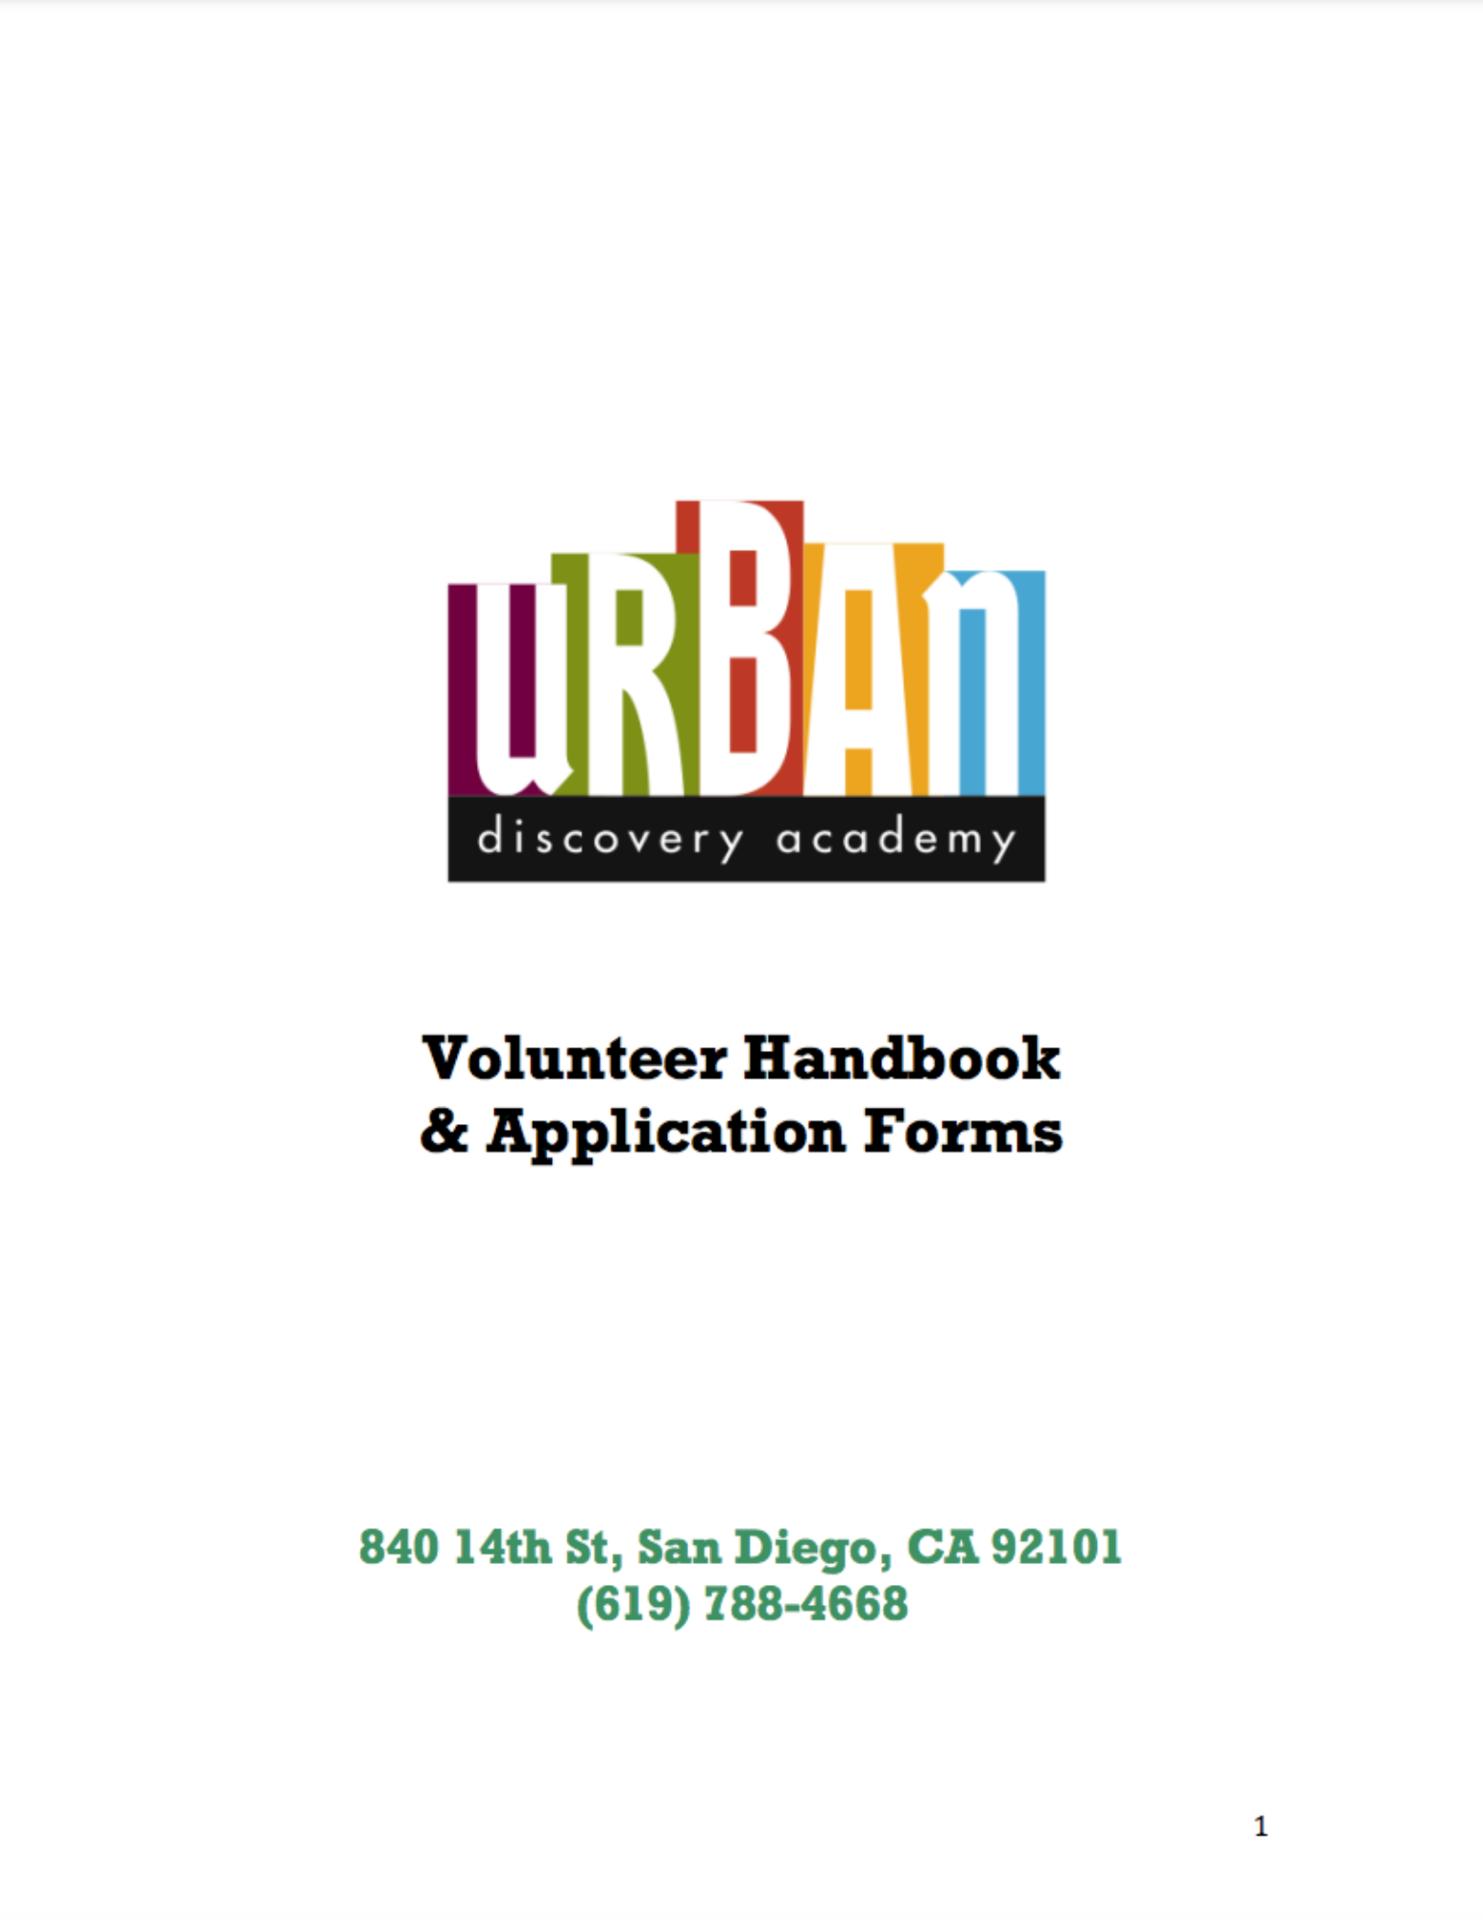 Urban Discovery Schools Volunteer Handbook